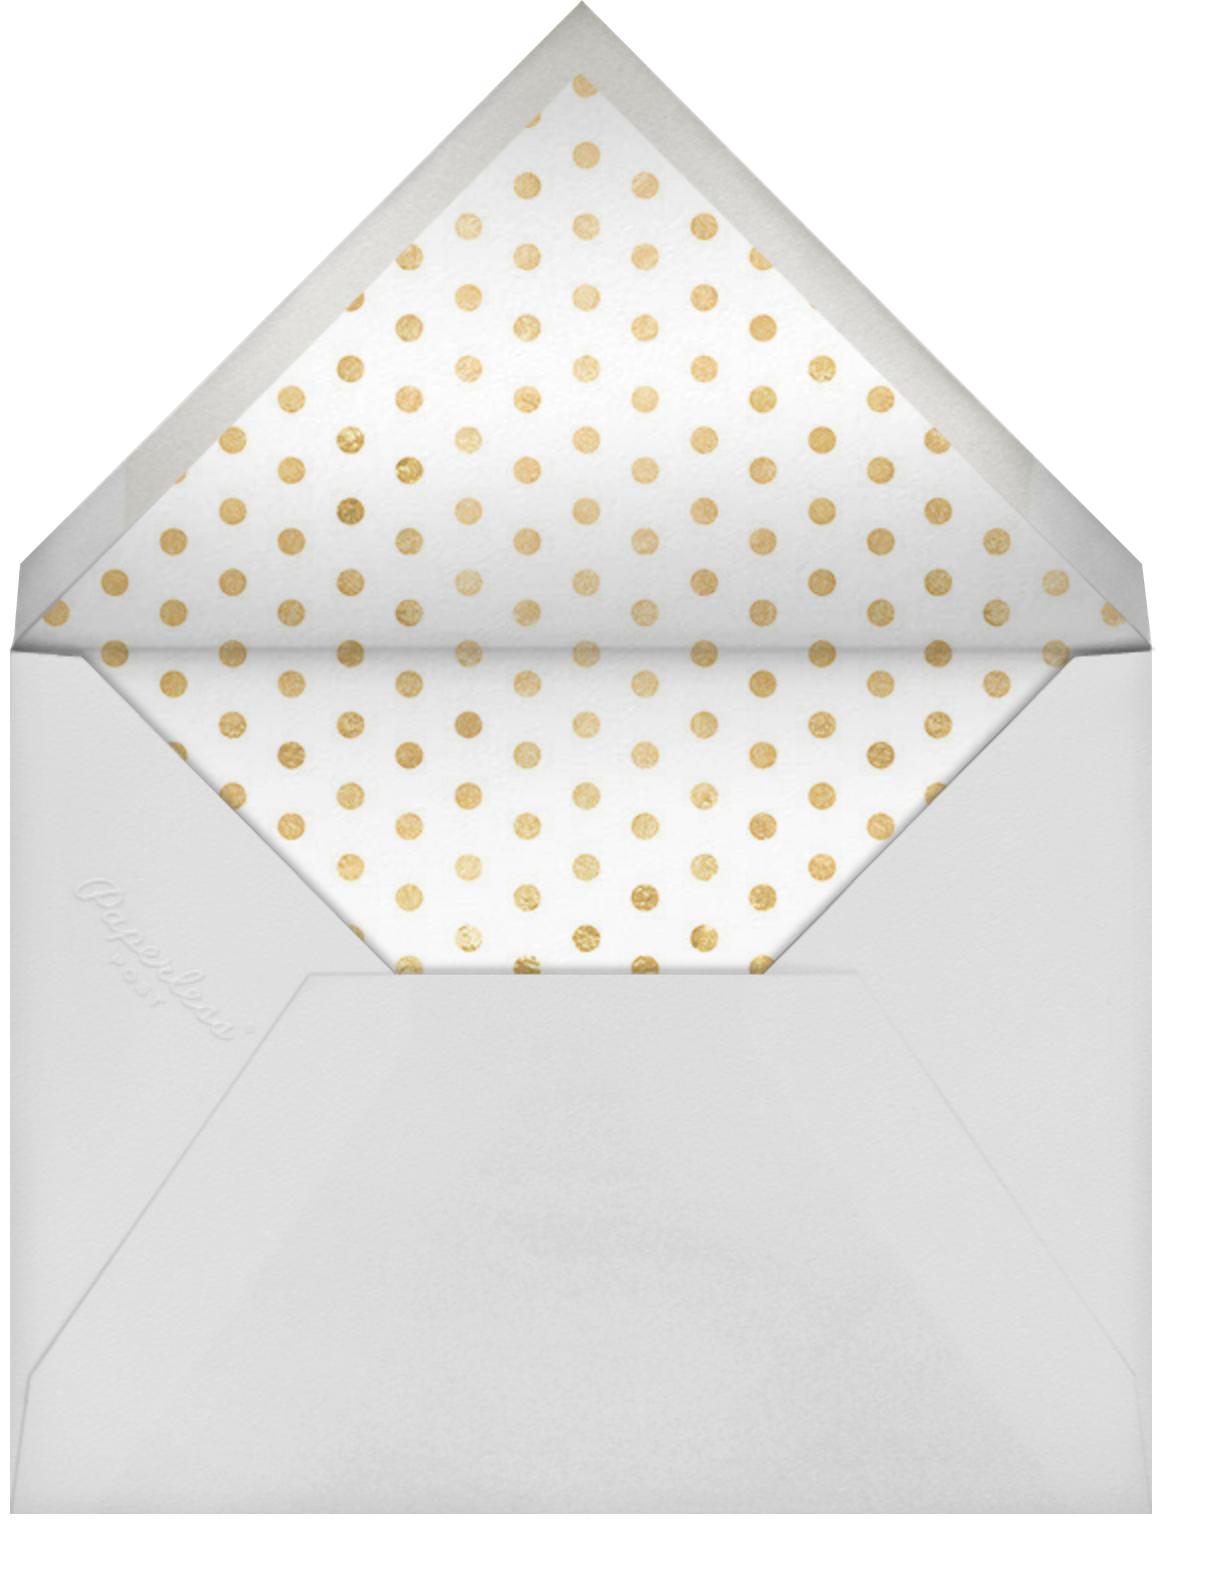 Champagne Tower - Fair - Rifle Paper Co. - Milestone  - envelope back